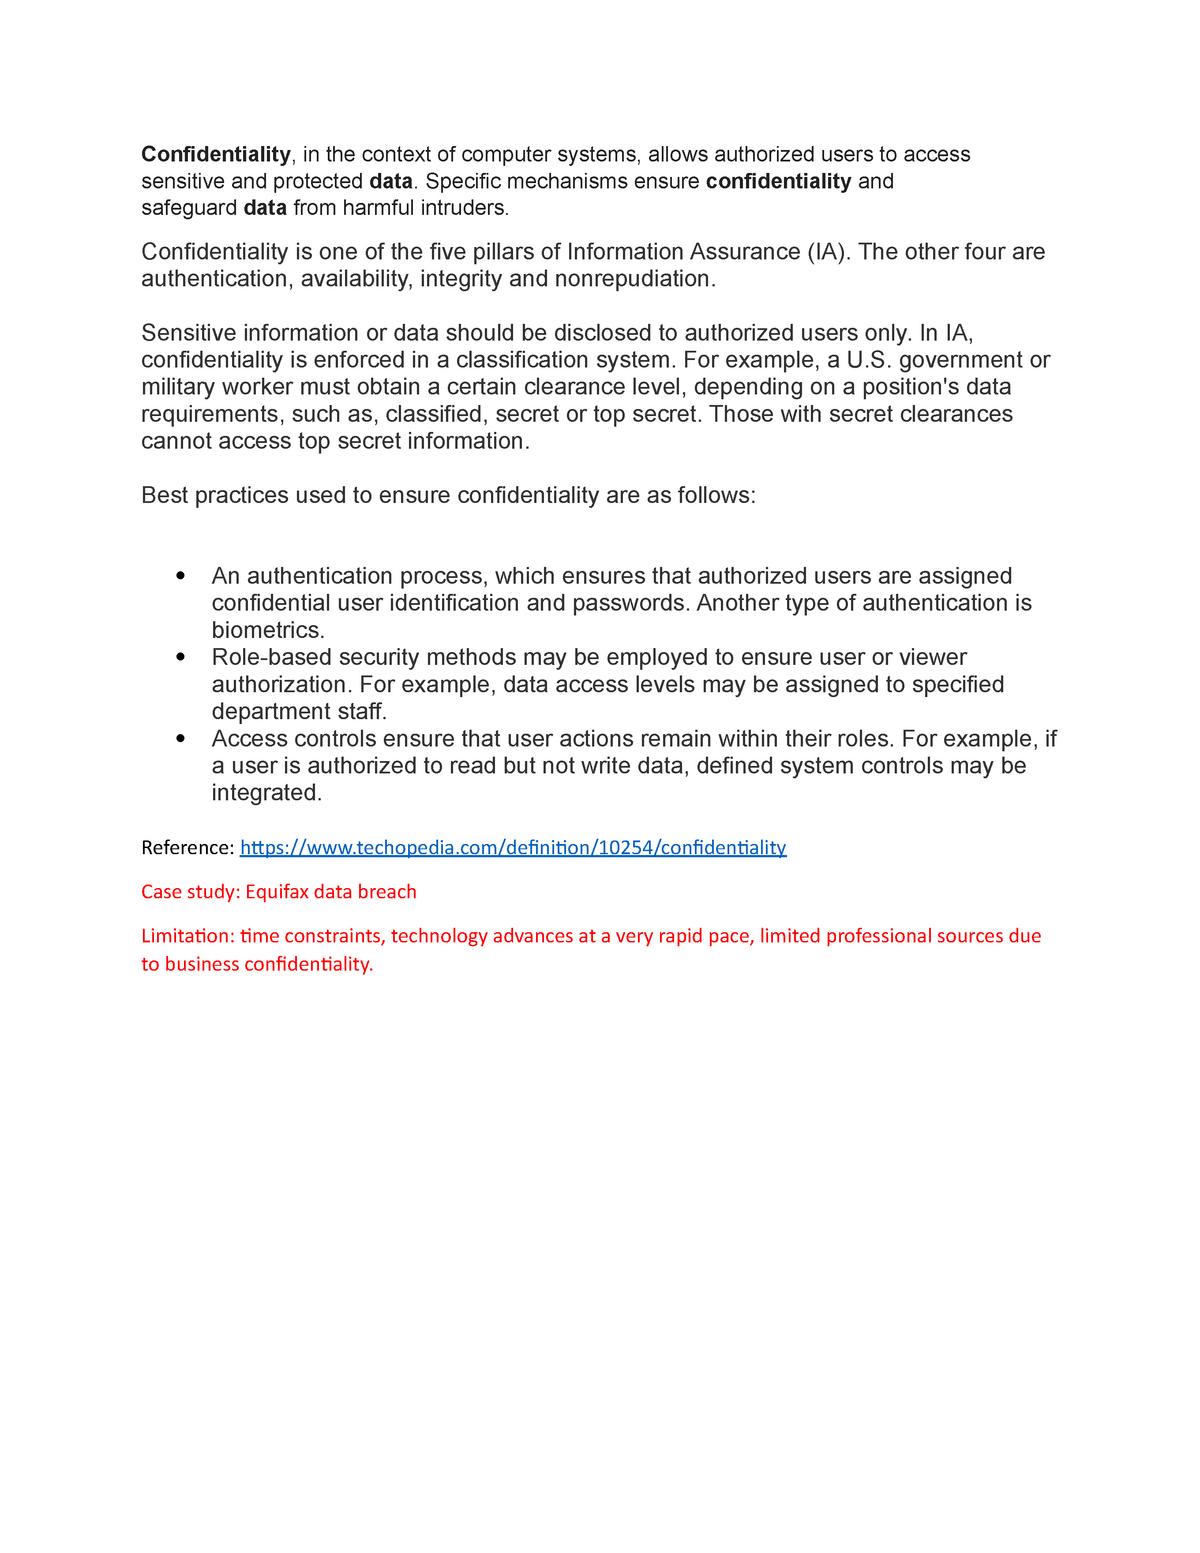 Data confidentiality - ITS 832 - StuDocu